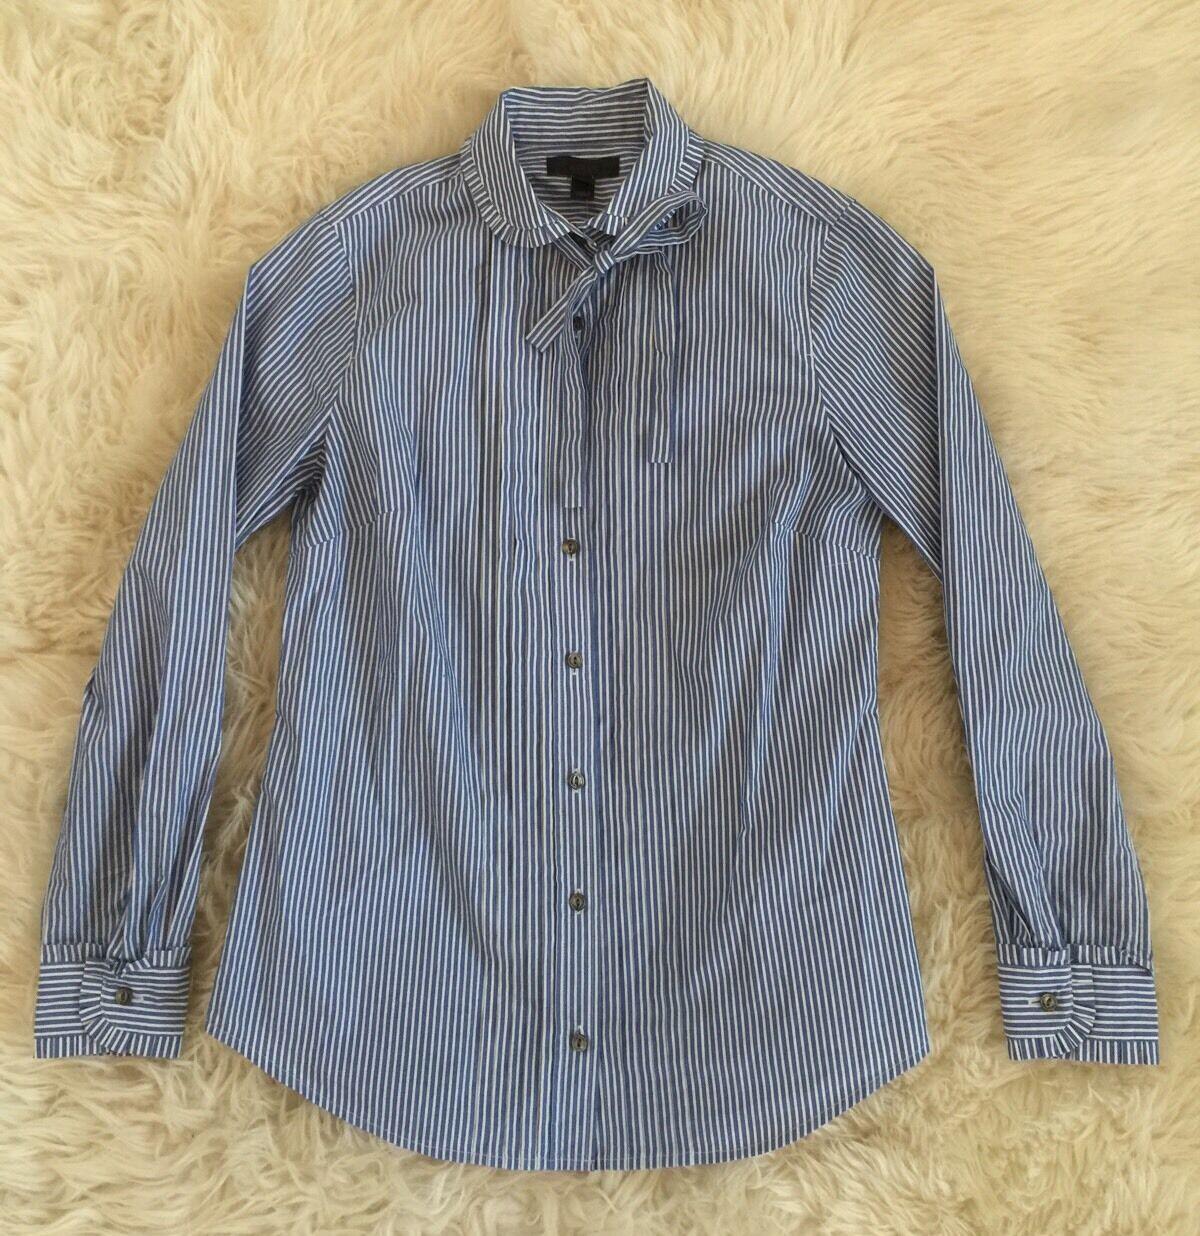 New J.Crew Striped Tie-neck Tuxedo Shirt With Ruffles  0 Blau F8446